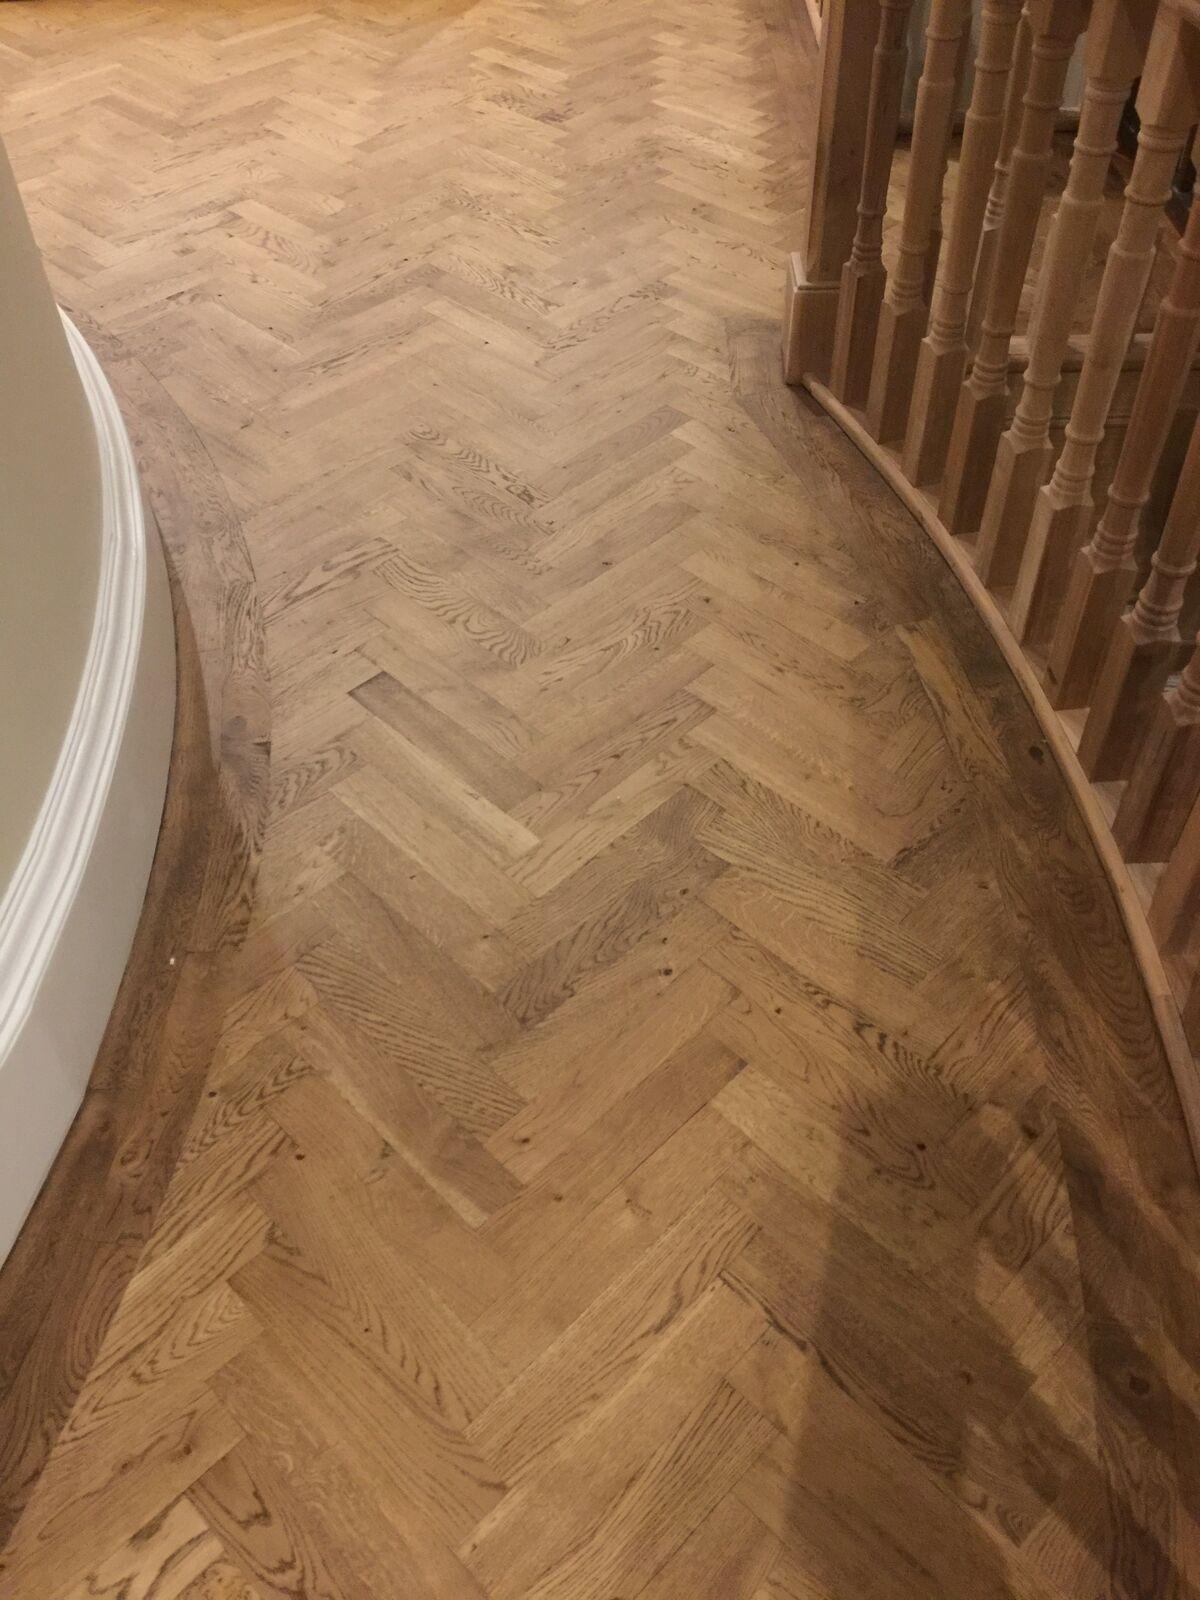 Parquet Oak Wood Flooring in Natural Finish Herringbone or Fishbone Design